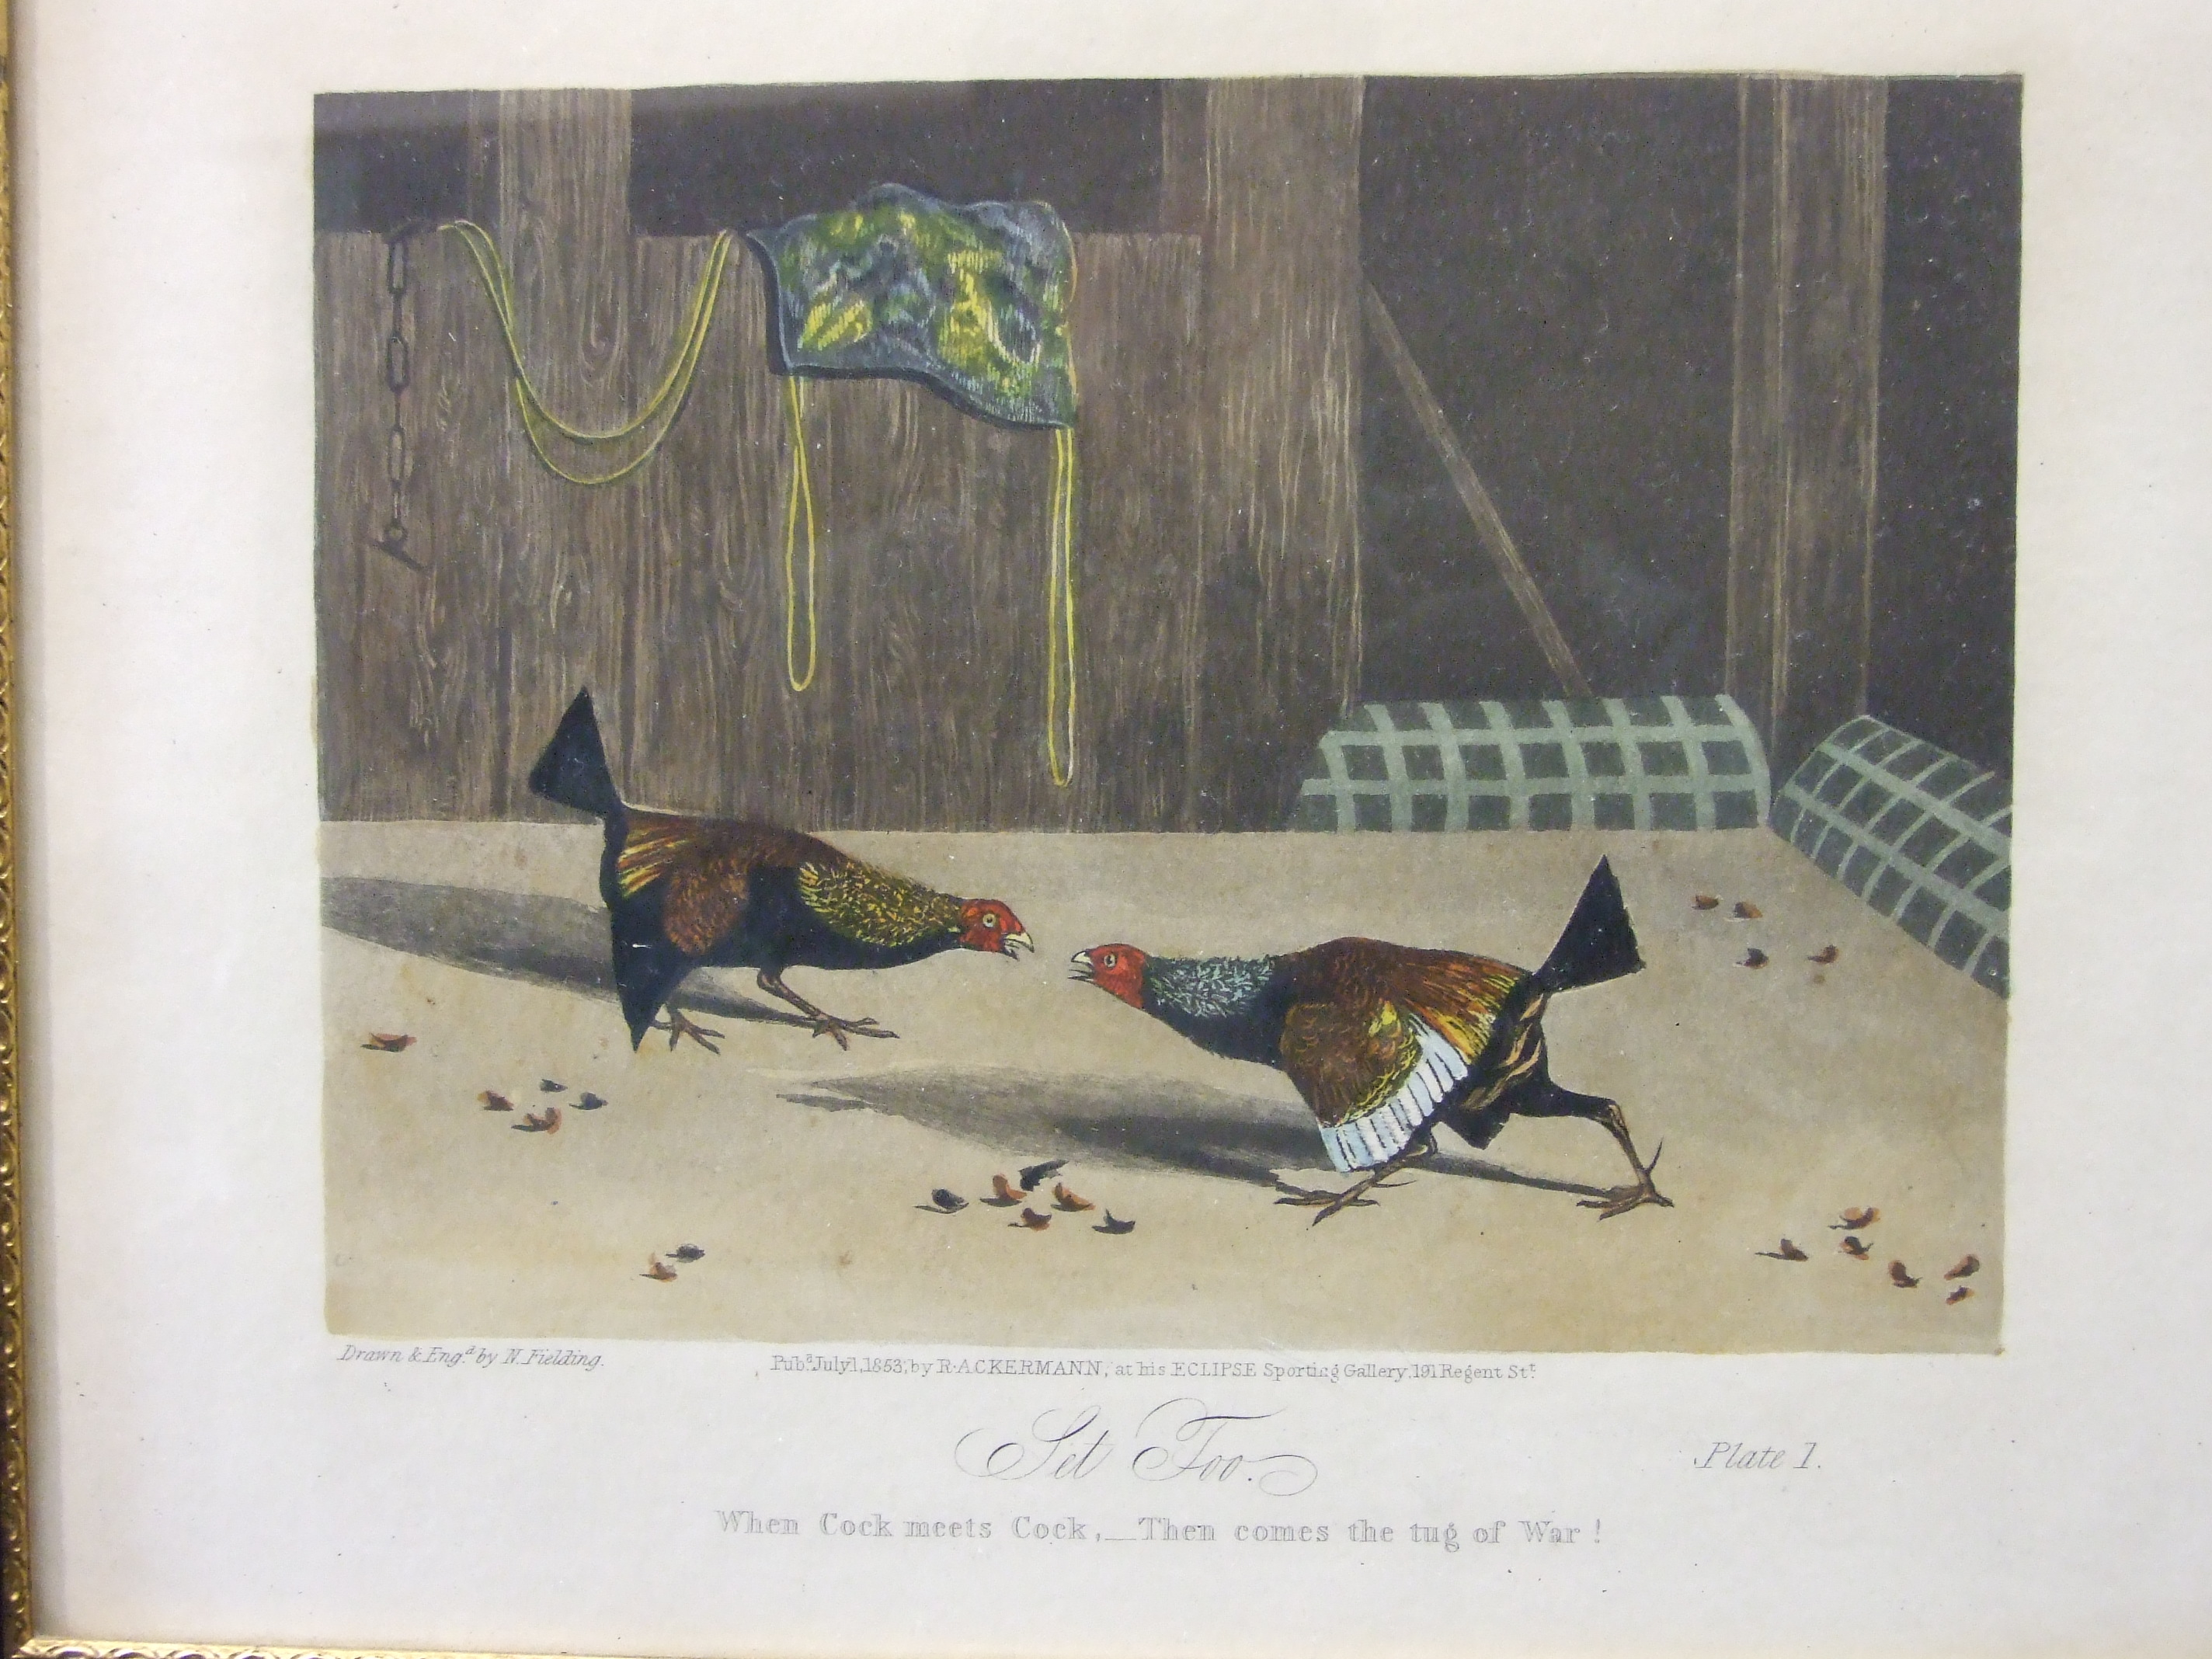 Lot 56 - After N Fielding, a set of six cock fighting prints, pub. R A Ackermann 1853, 22 x 27cm, (6).